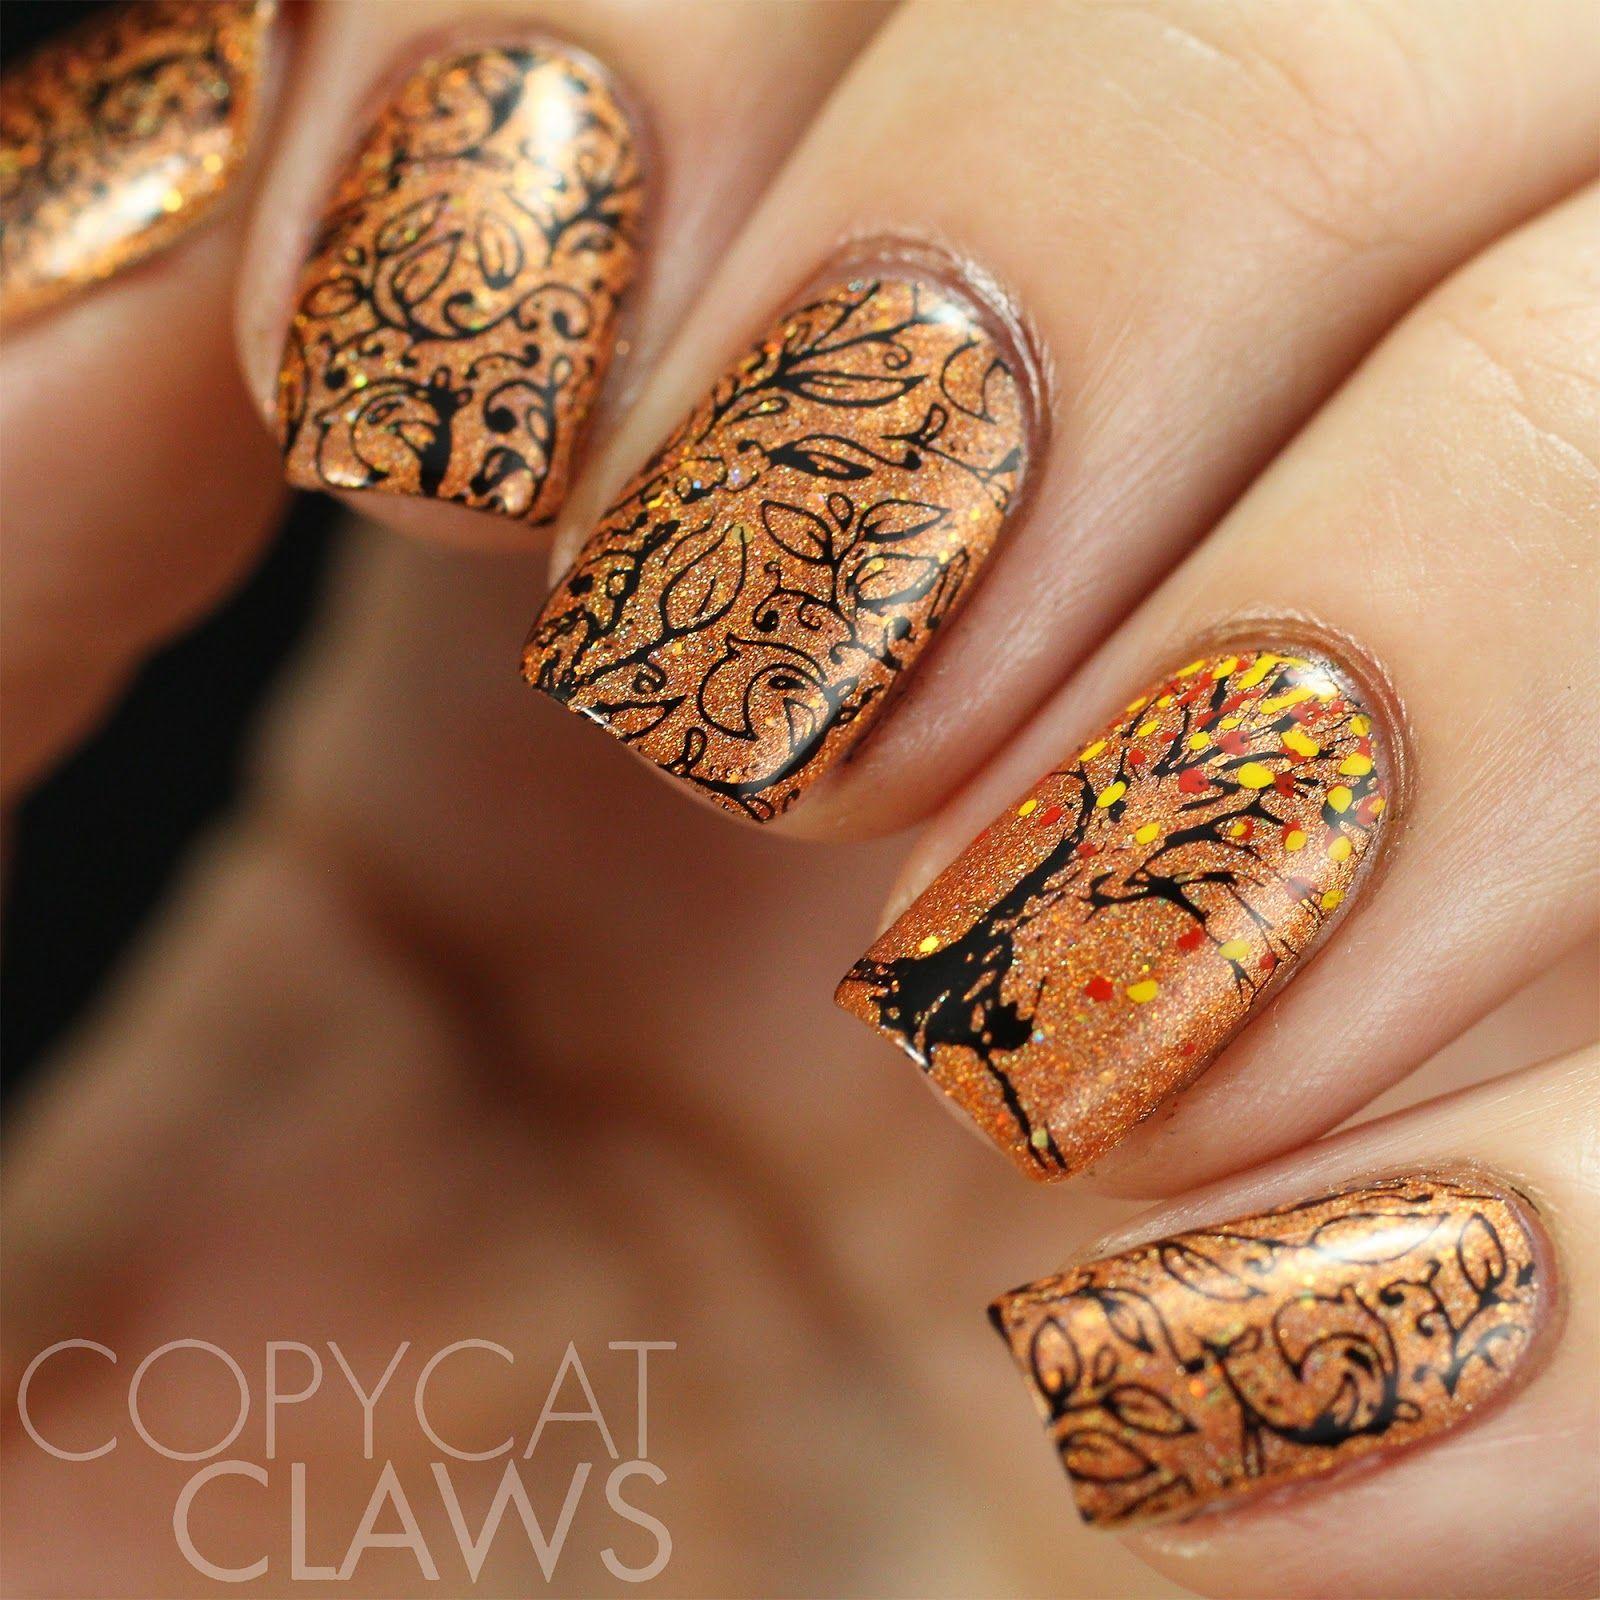 Copycat Claws: 40 Great Nail Art Ideas - Autumn | nail art ...